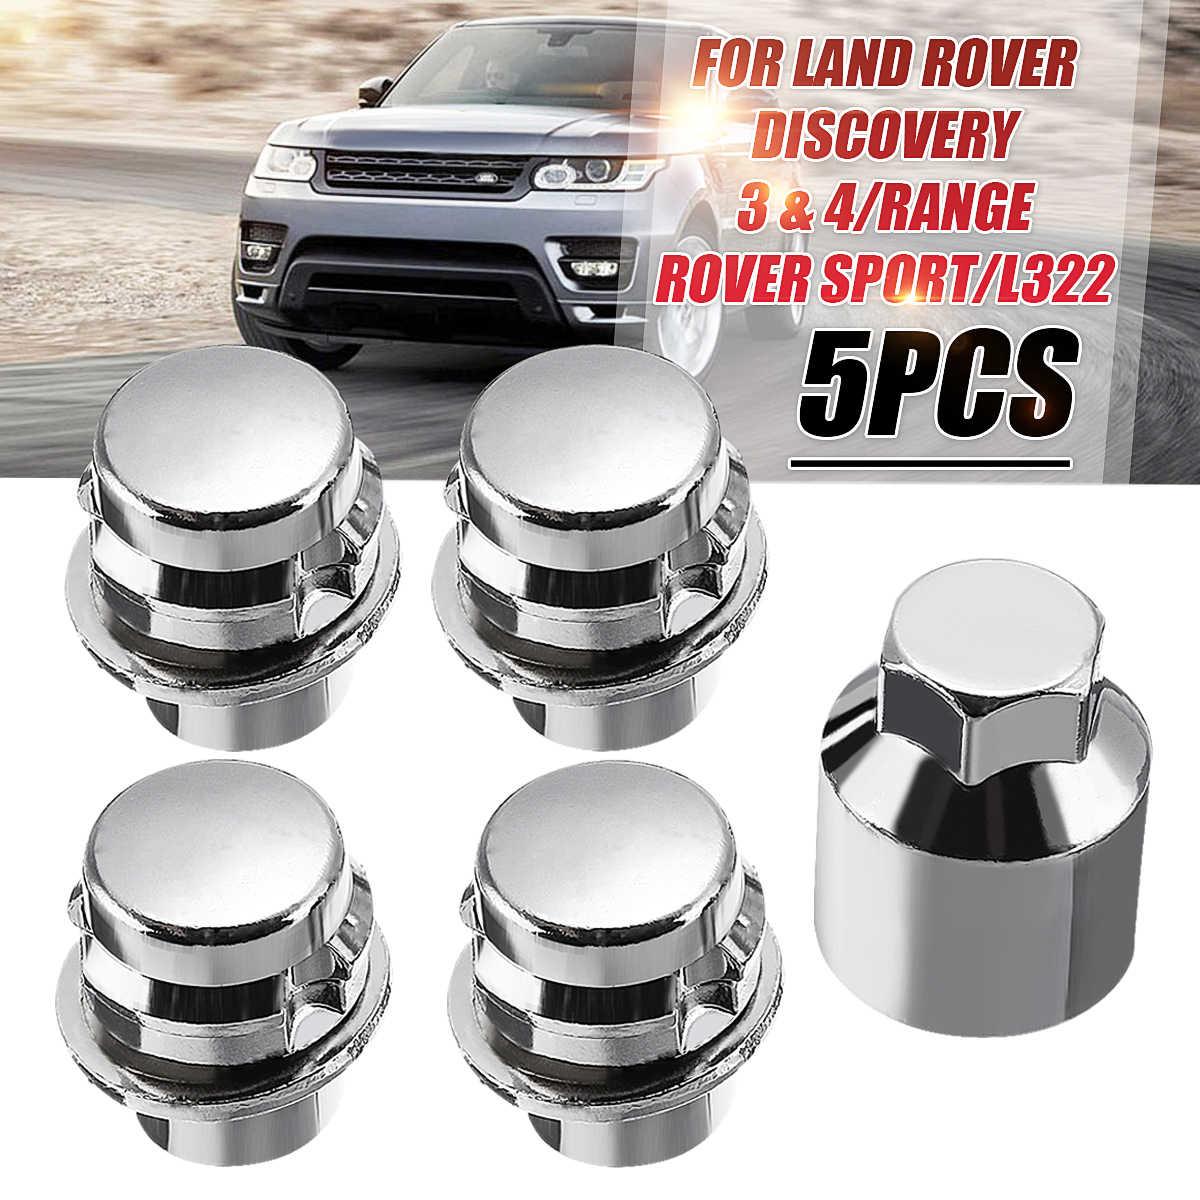 PARACHOQUES Trasero DYR500010 Clip 4x Ajuste Para Land Rover Range Rover Sport remolque universal